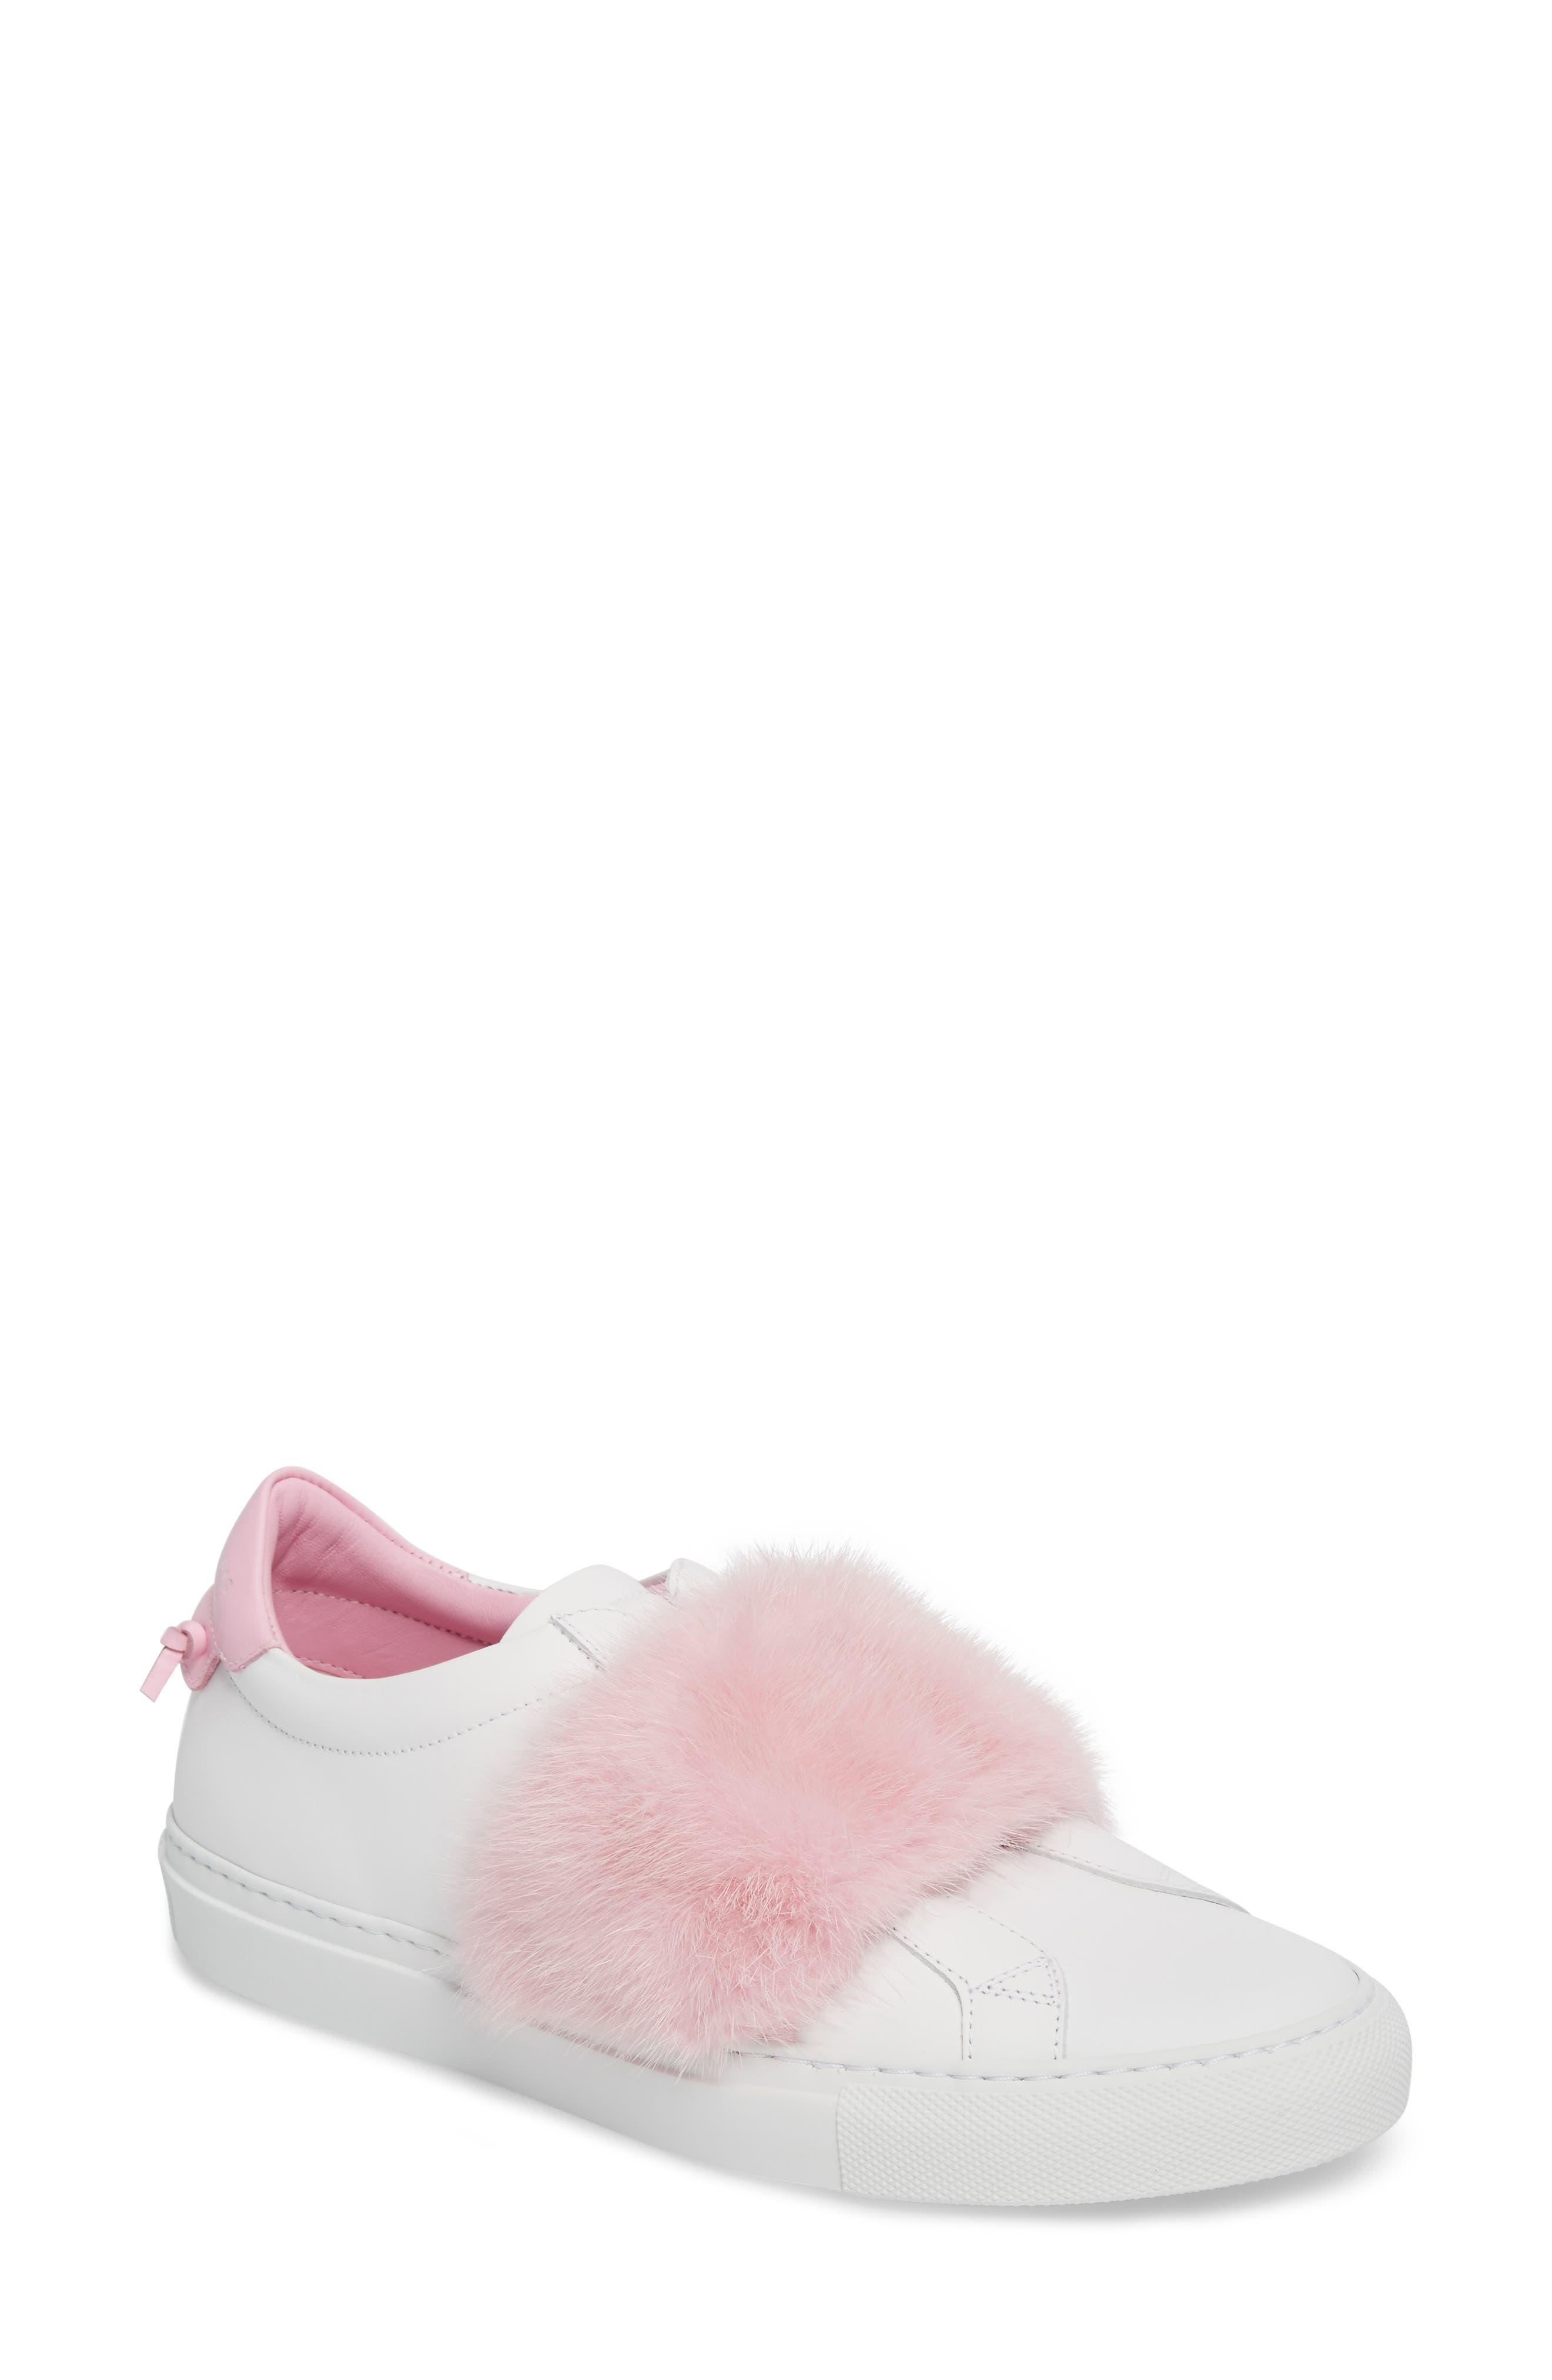 Urban Street Slip-On Sneaker with Genuine Mink Fur Trim,                         Main,                         color, White/ Pink